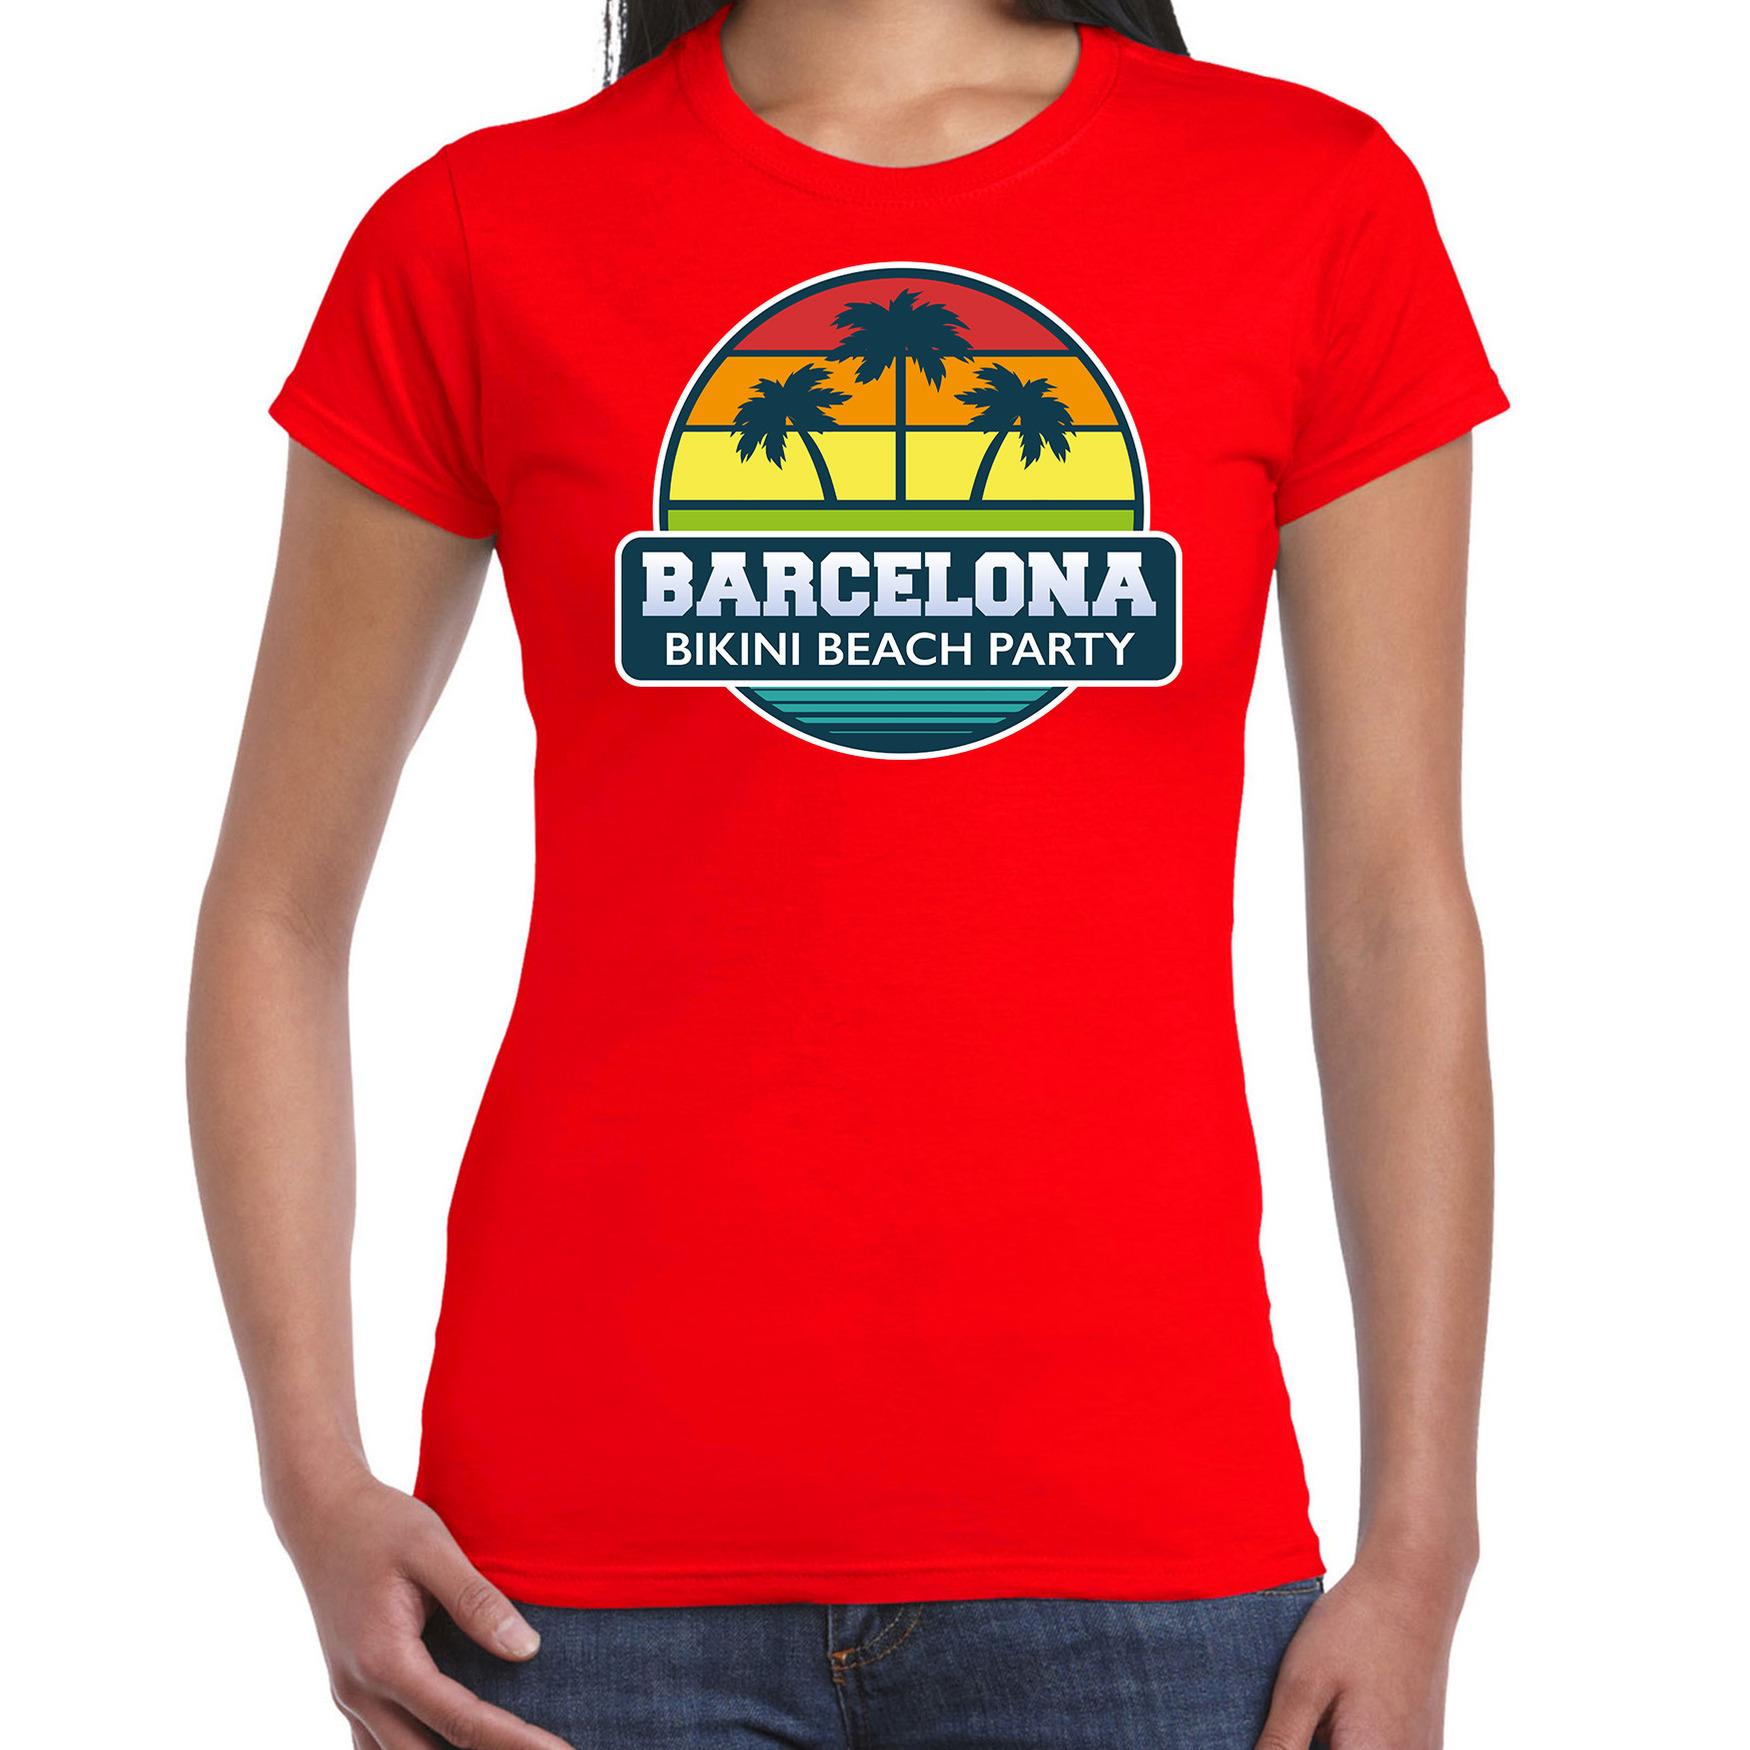 Barcelona zomer t-shirt / shirt Barcelona bikini beach party rood voor dames